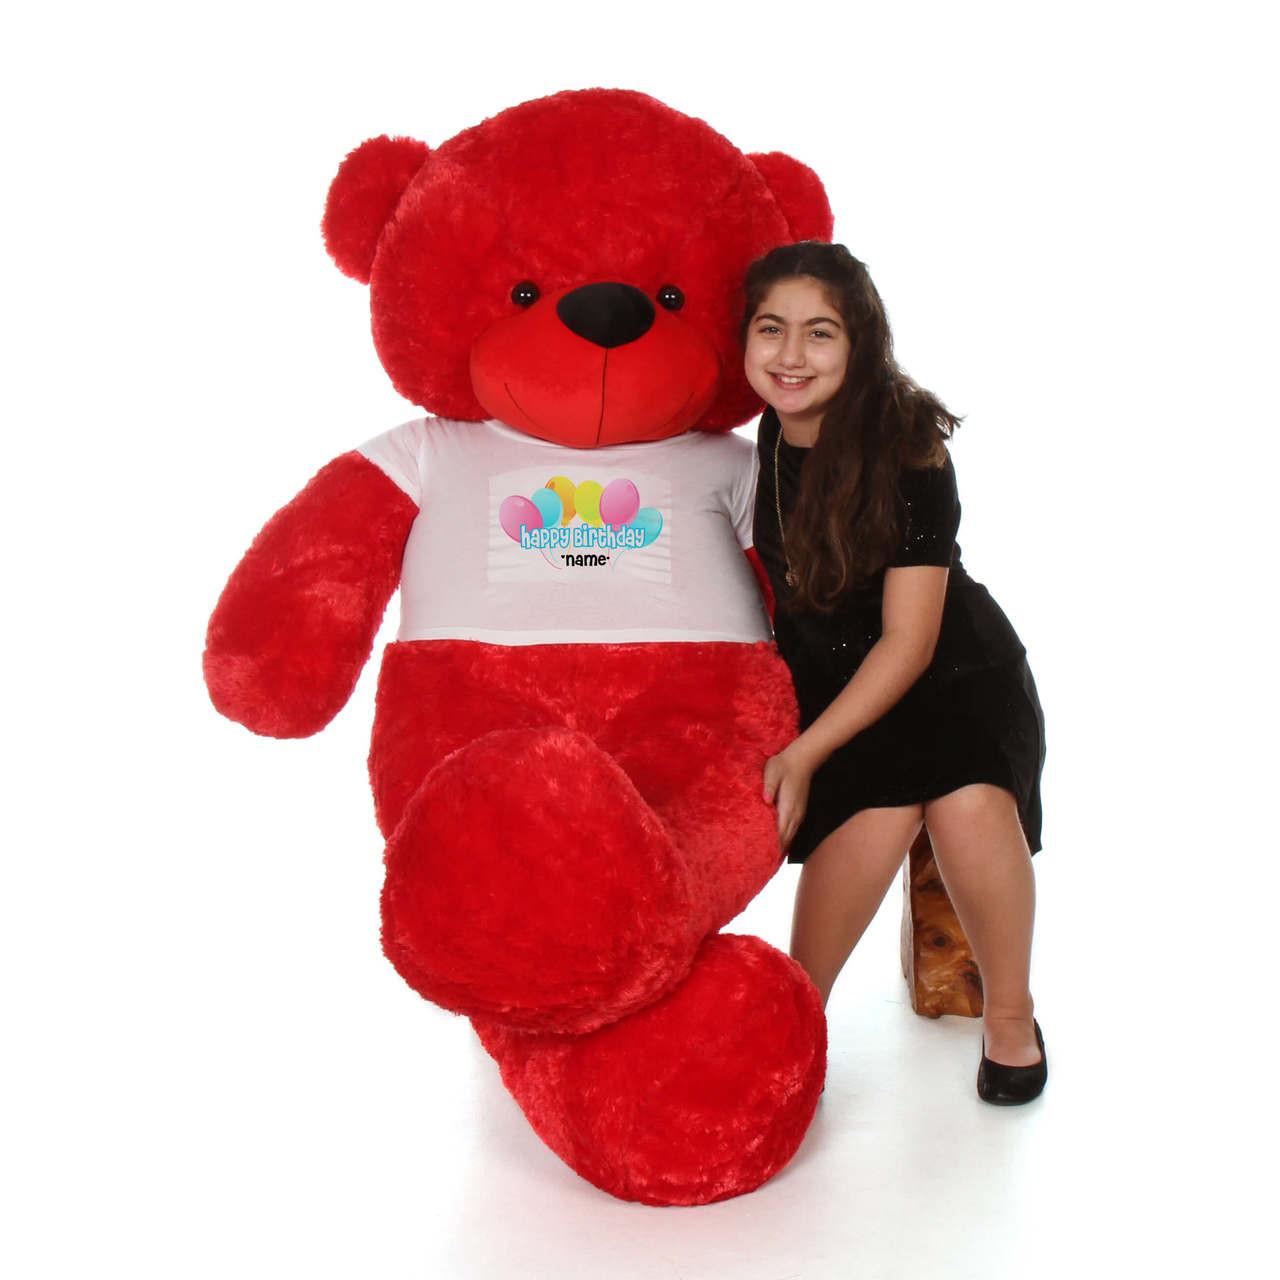 6 Foot Red Bitsy Cuddles Happy Birthday Personalized Teddy Bear - Balloon Design